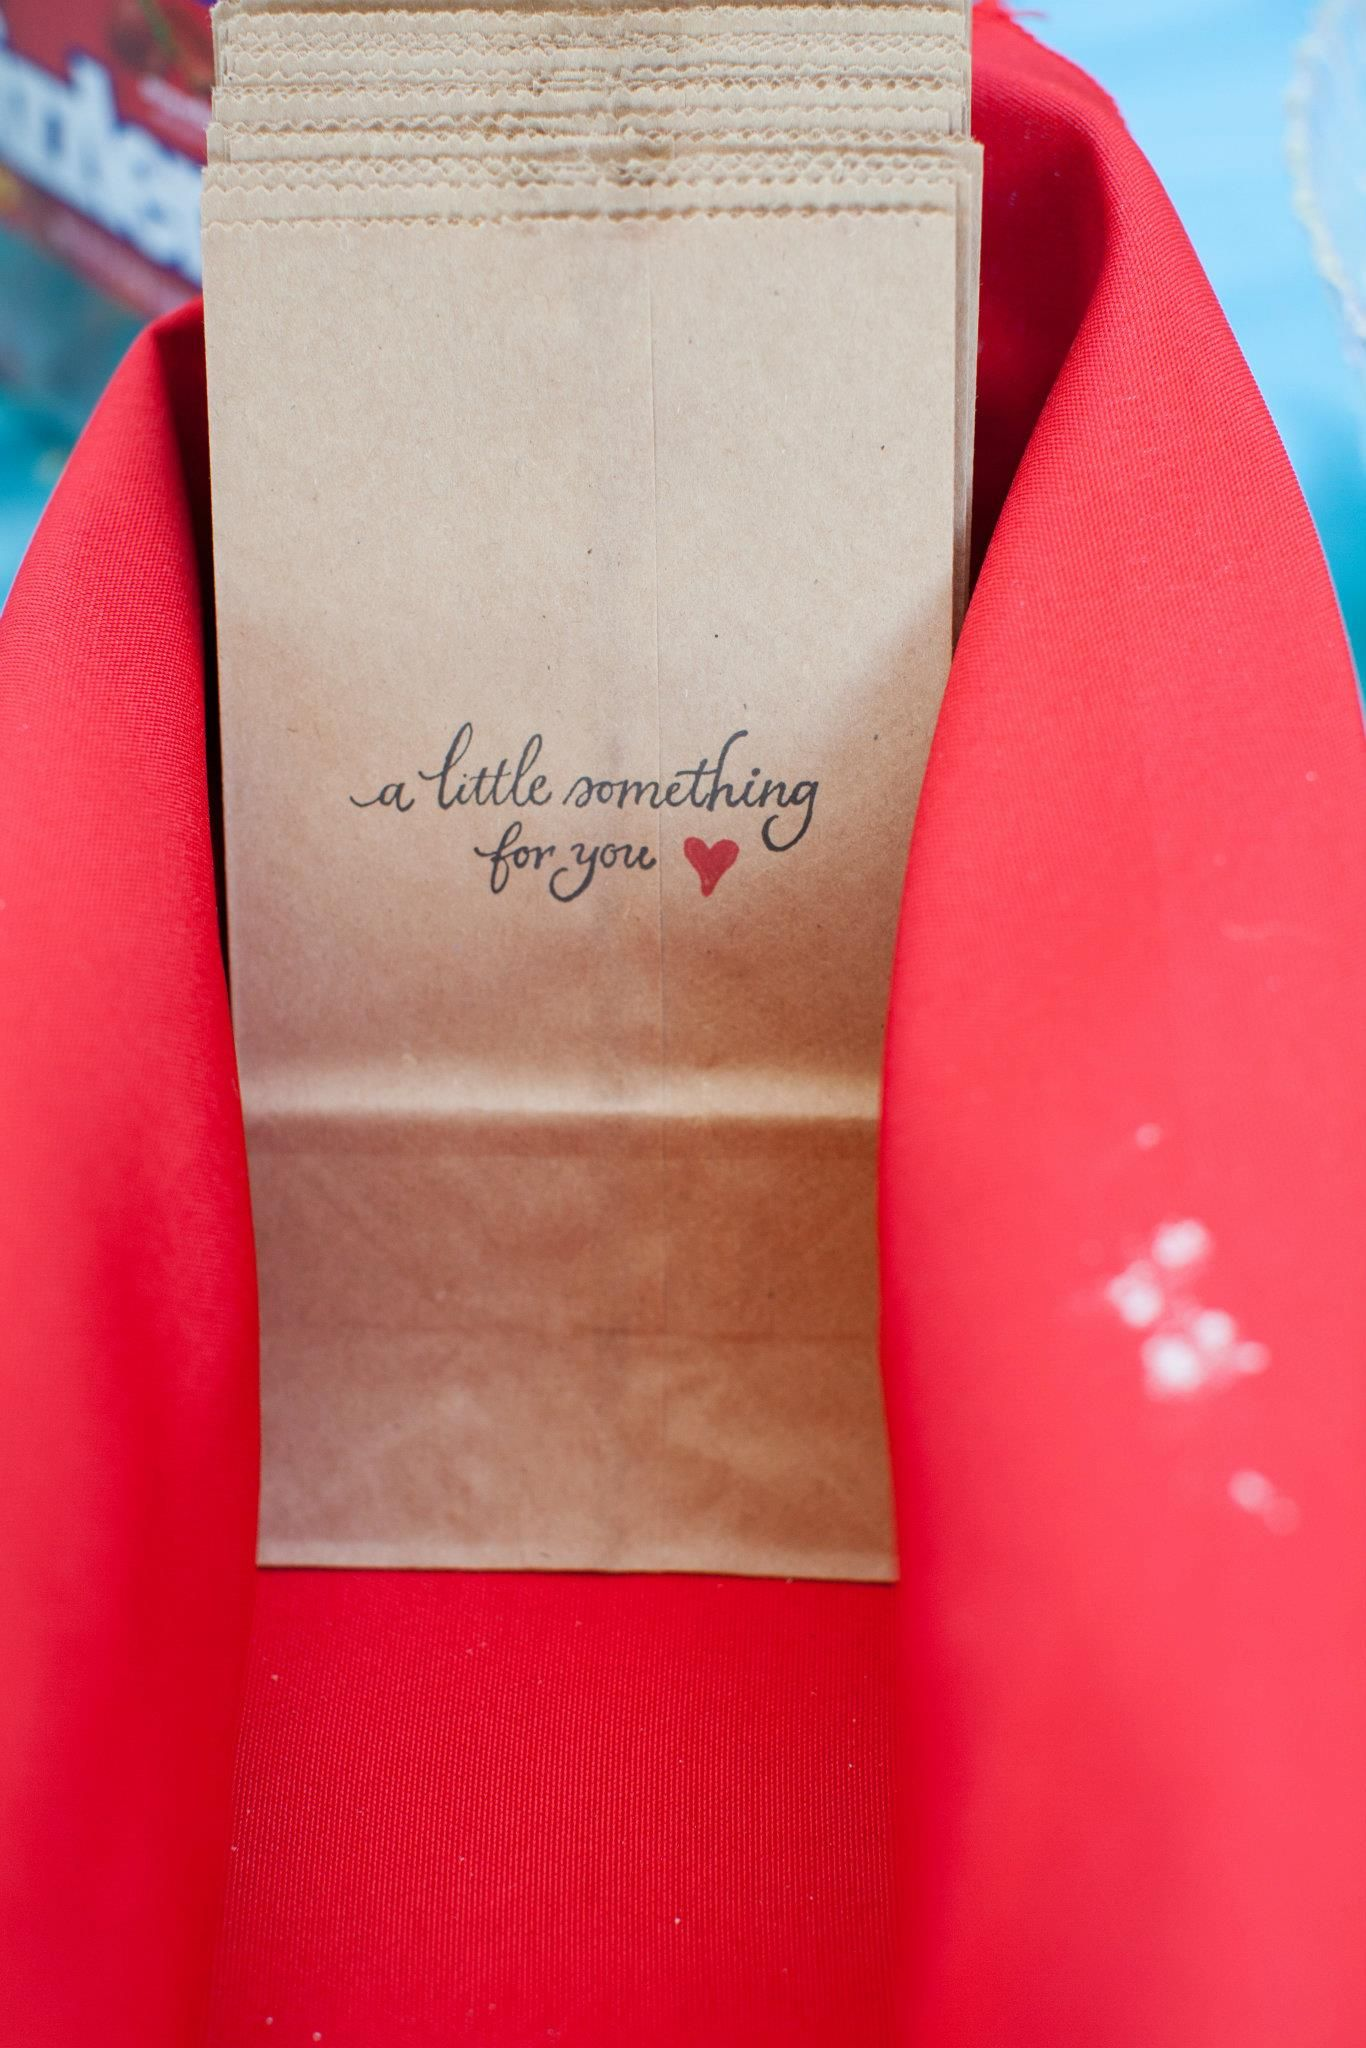 Candy Wedding Favor Ideas Pinterest : wedding favor ideas // wedding candy bar // candy bar favor // DIY ...